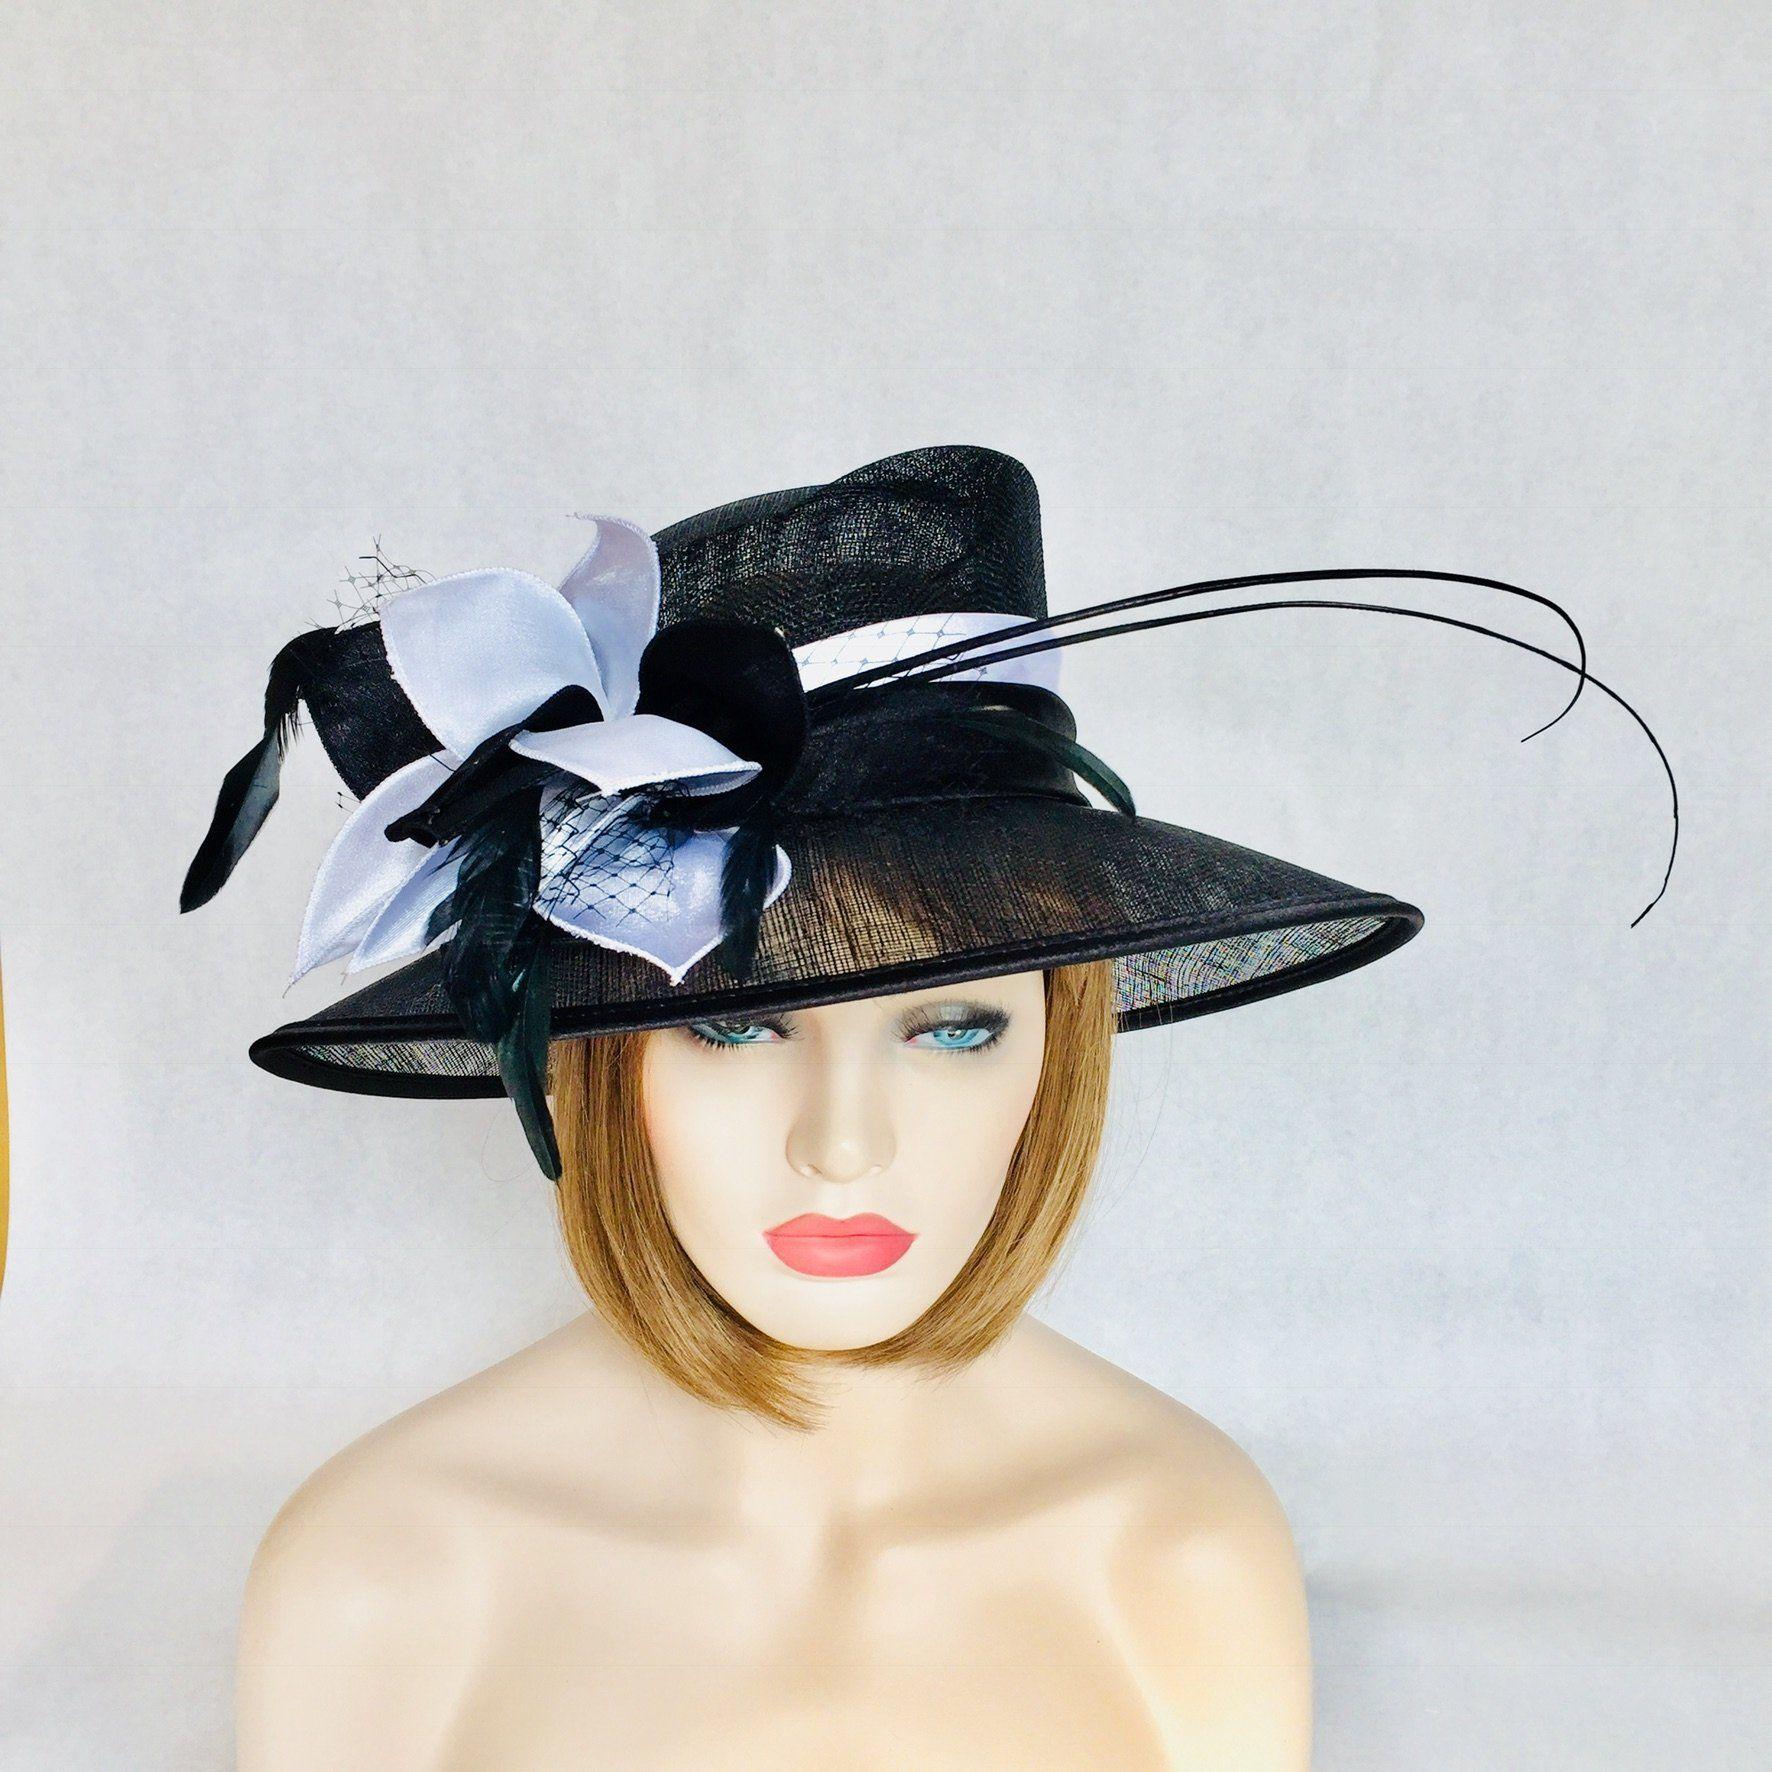 29fc98b6ccb312 Lady Jewel Black and White Tea Hats, Kentucky Derby Hats, Wedding Hats,  Captain